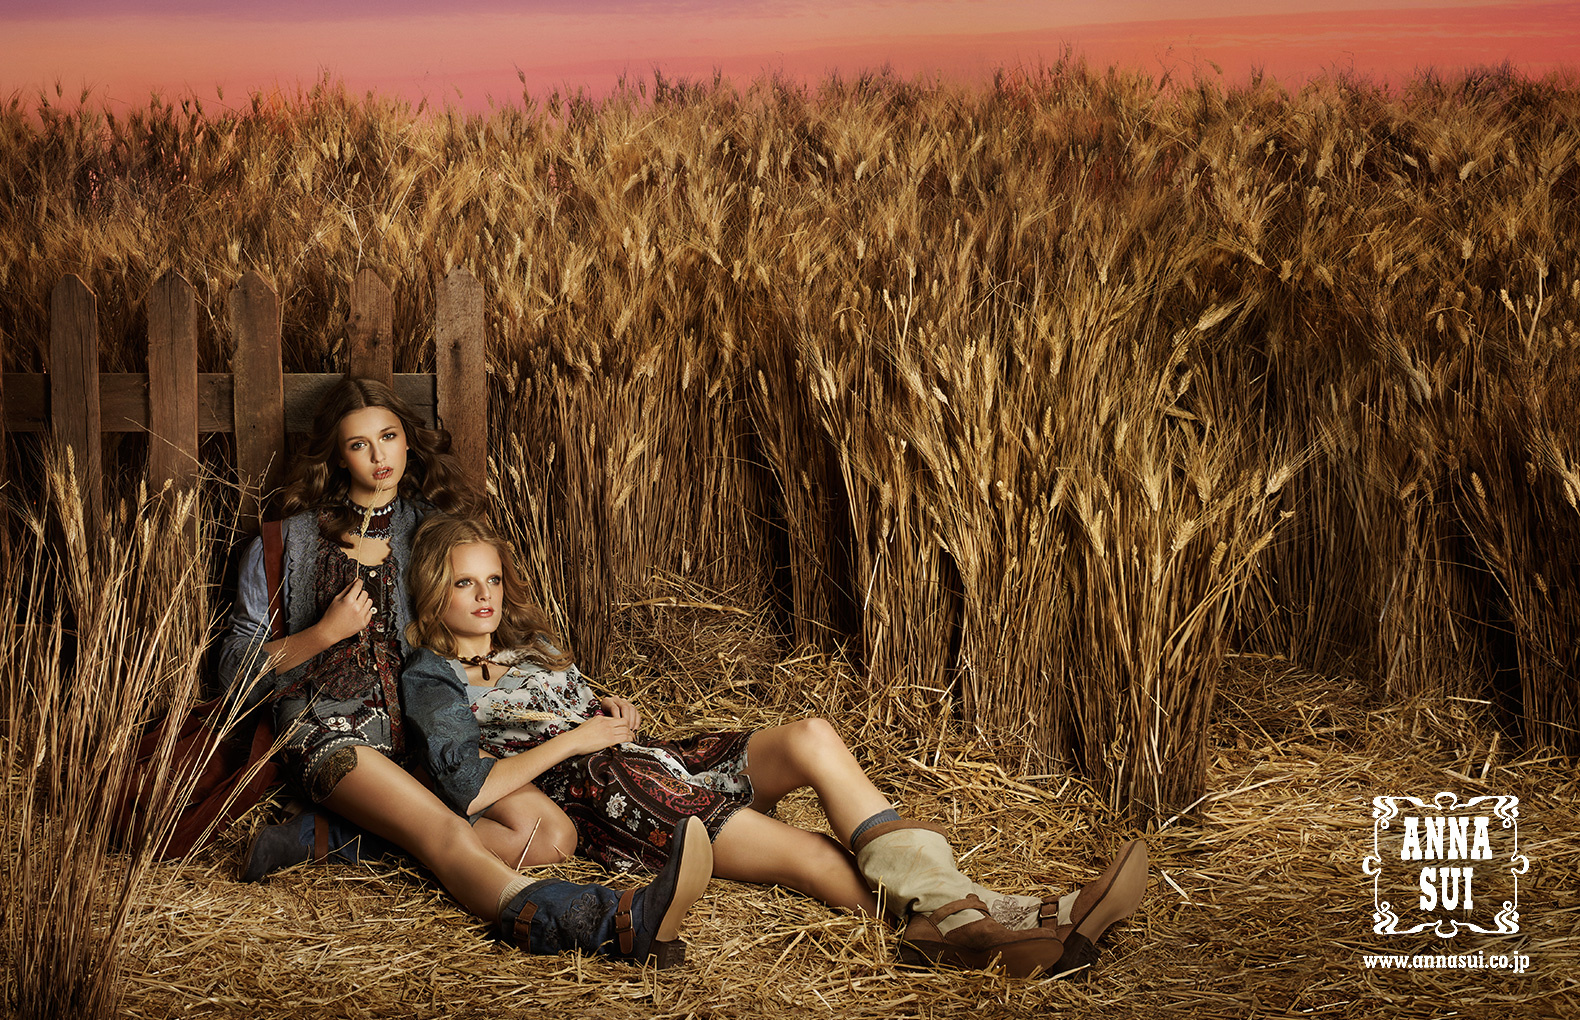 Hanne Gaby Odiele and Kristina Romanova for Anna Sui, s/s 2011. Photographed by Josh Jordan.